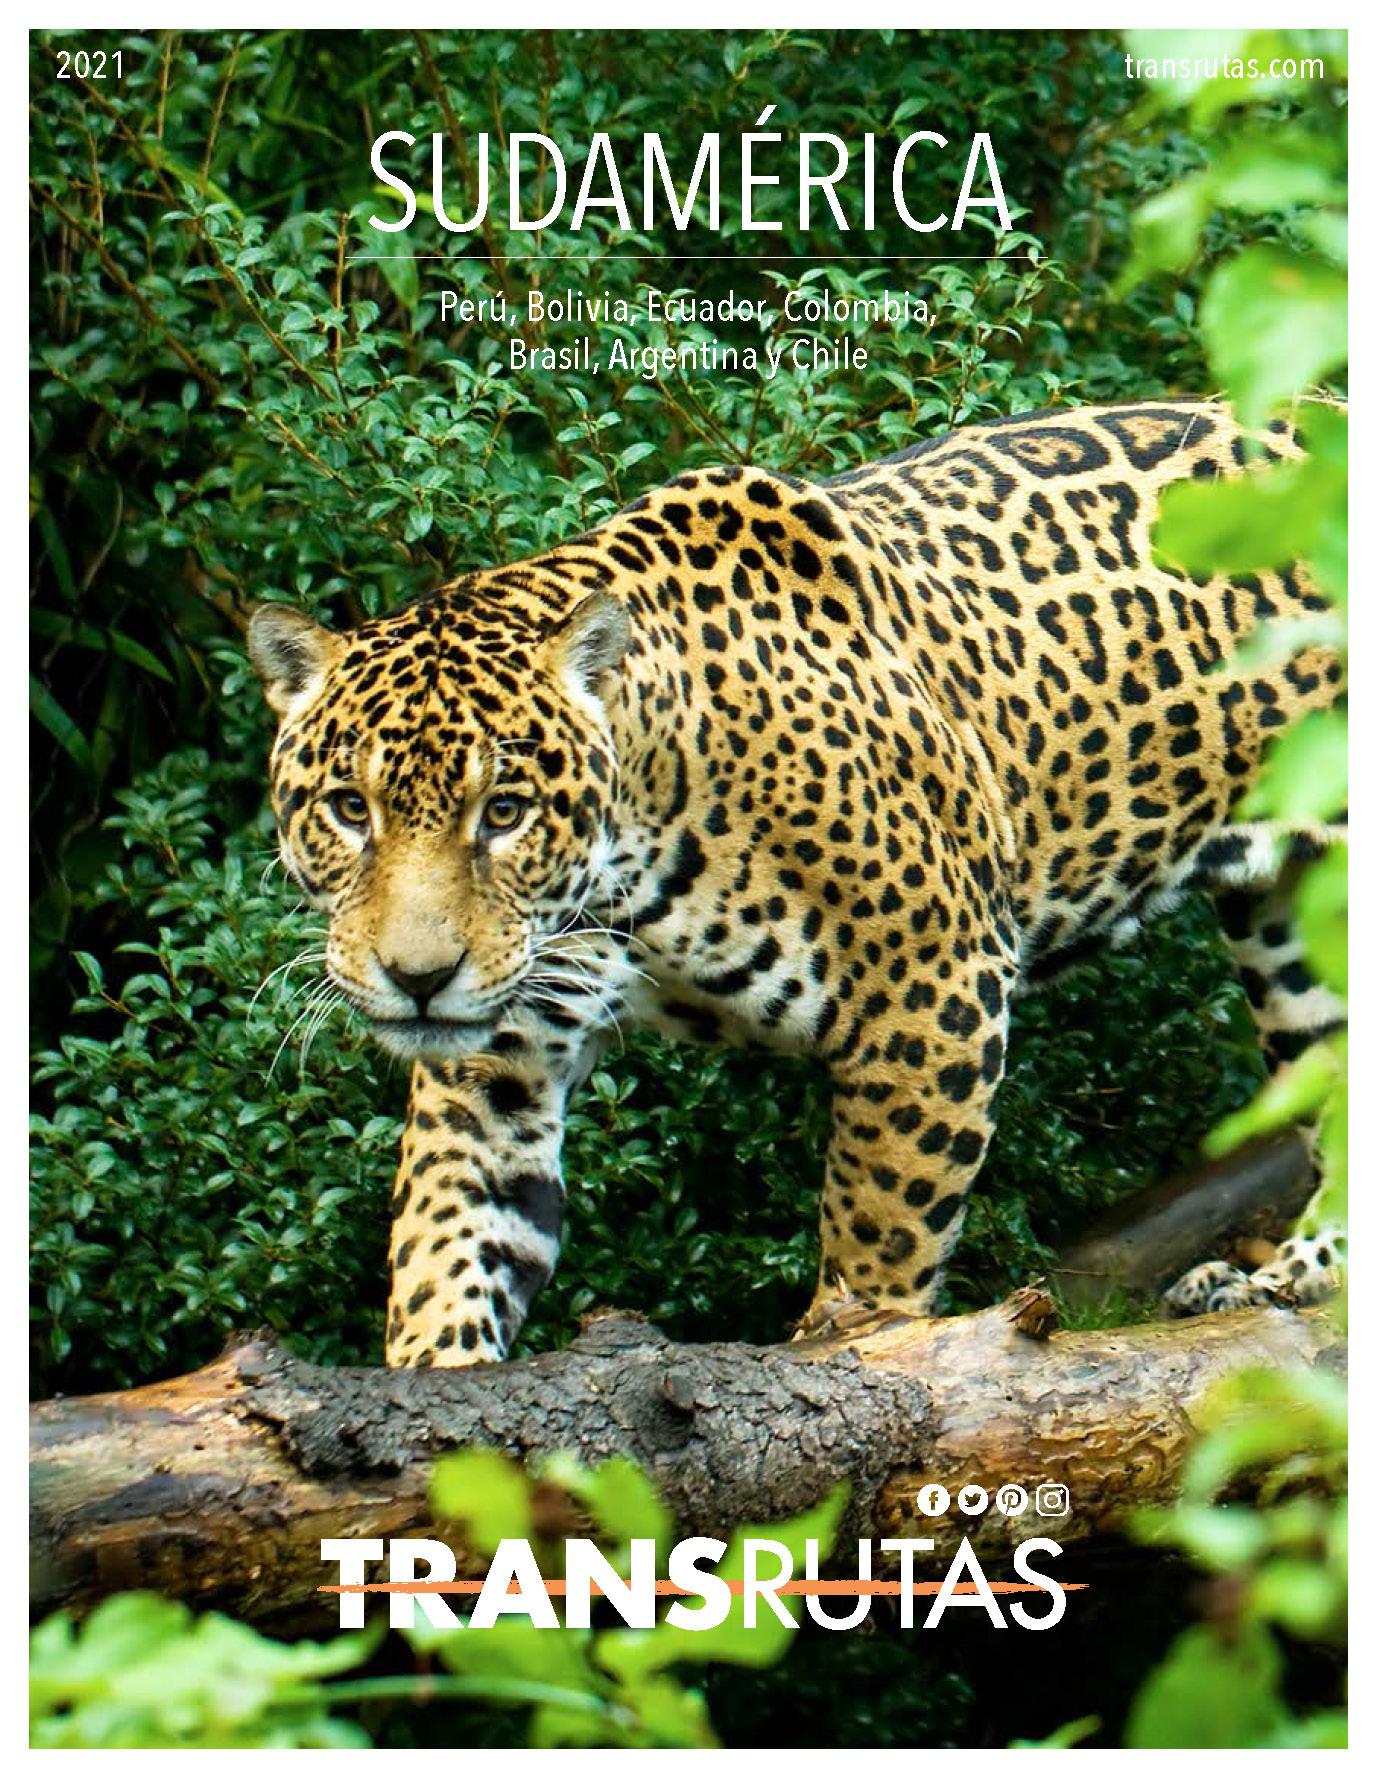 Catalogo Transrutas Sudamerica 2021